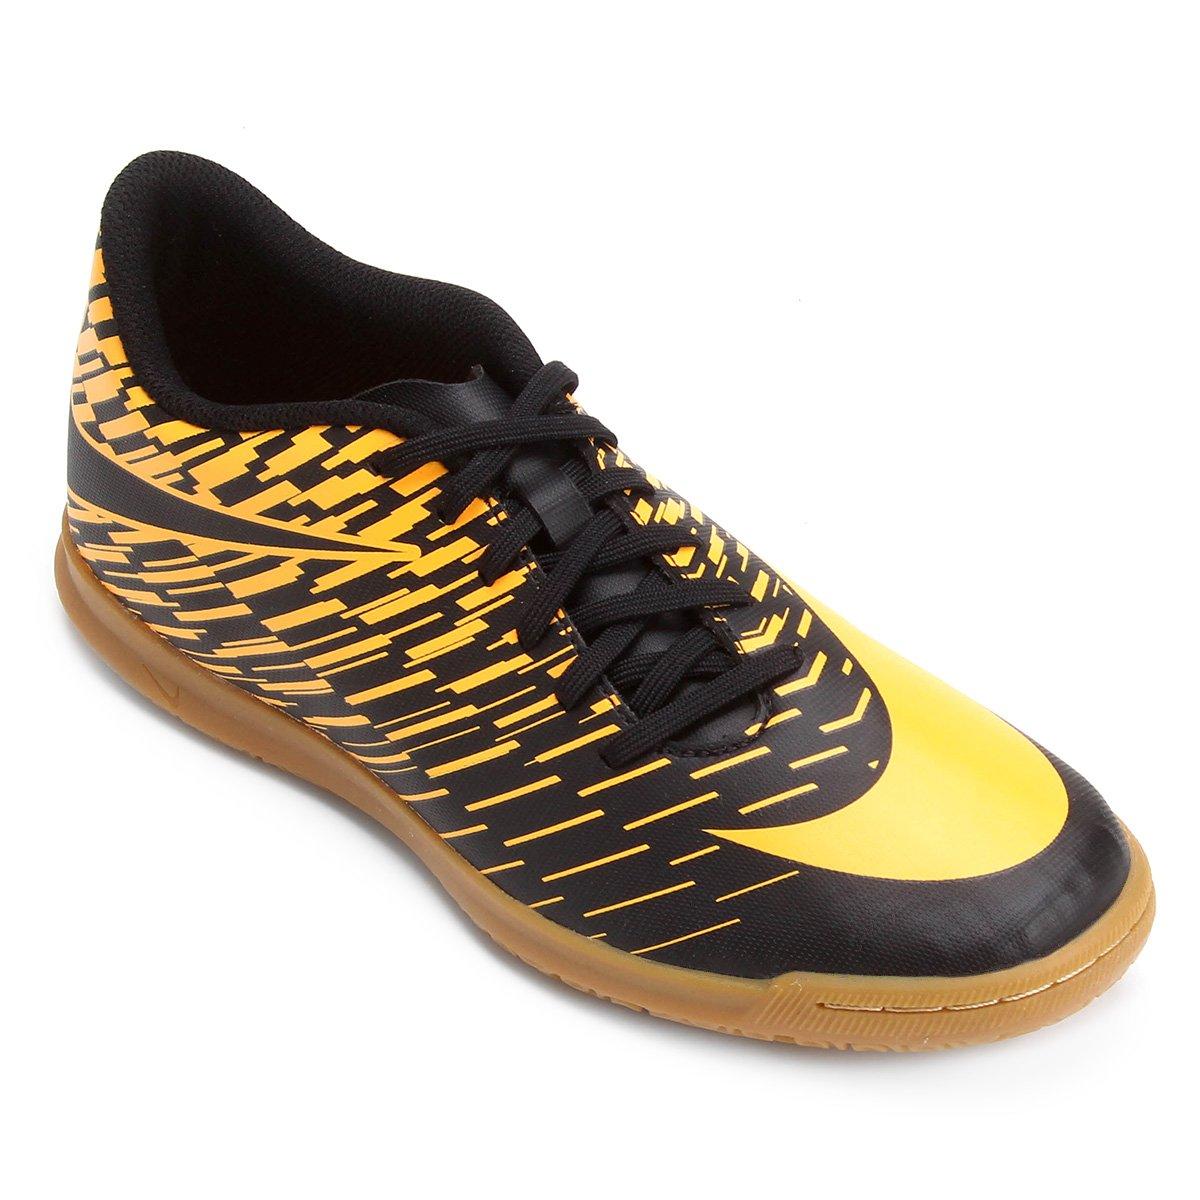 5d5d1d6a793 Chuteira Futsal Nike Bravata 2 IC - Preto e Laranja - Compre Agora ...